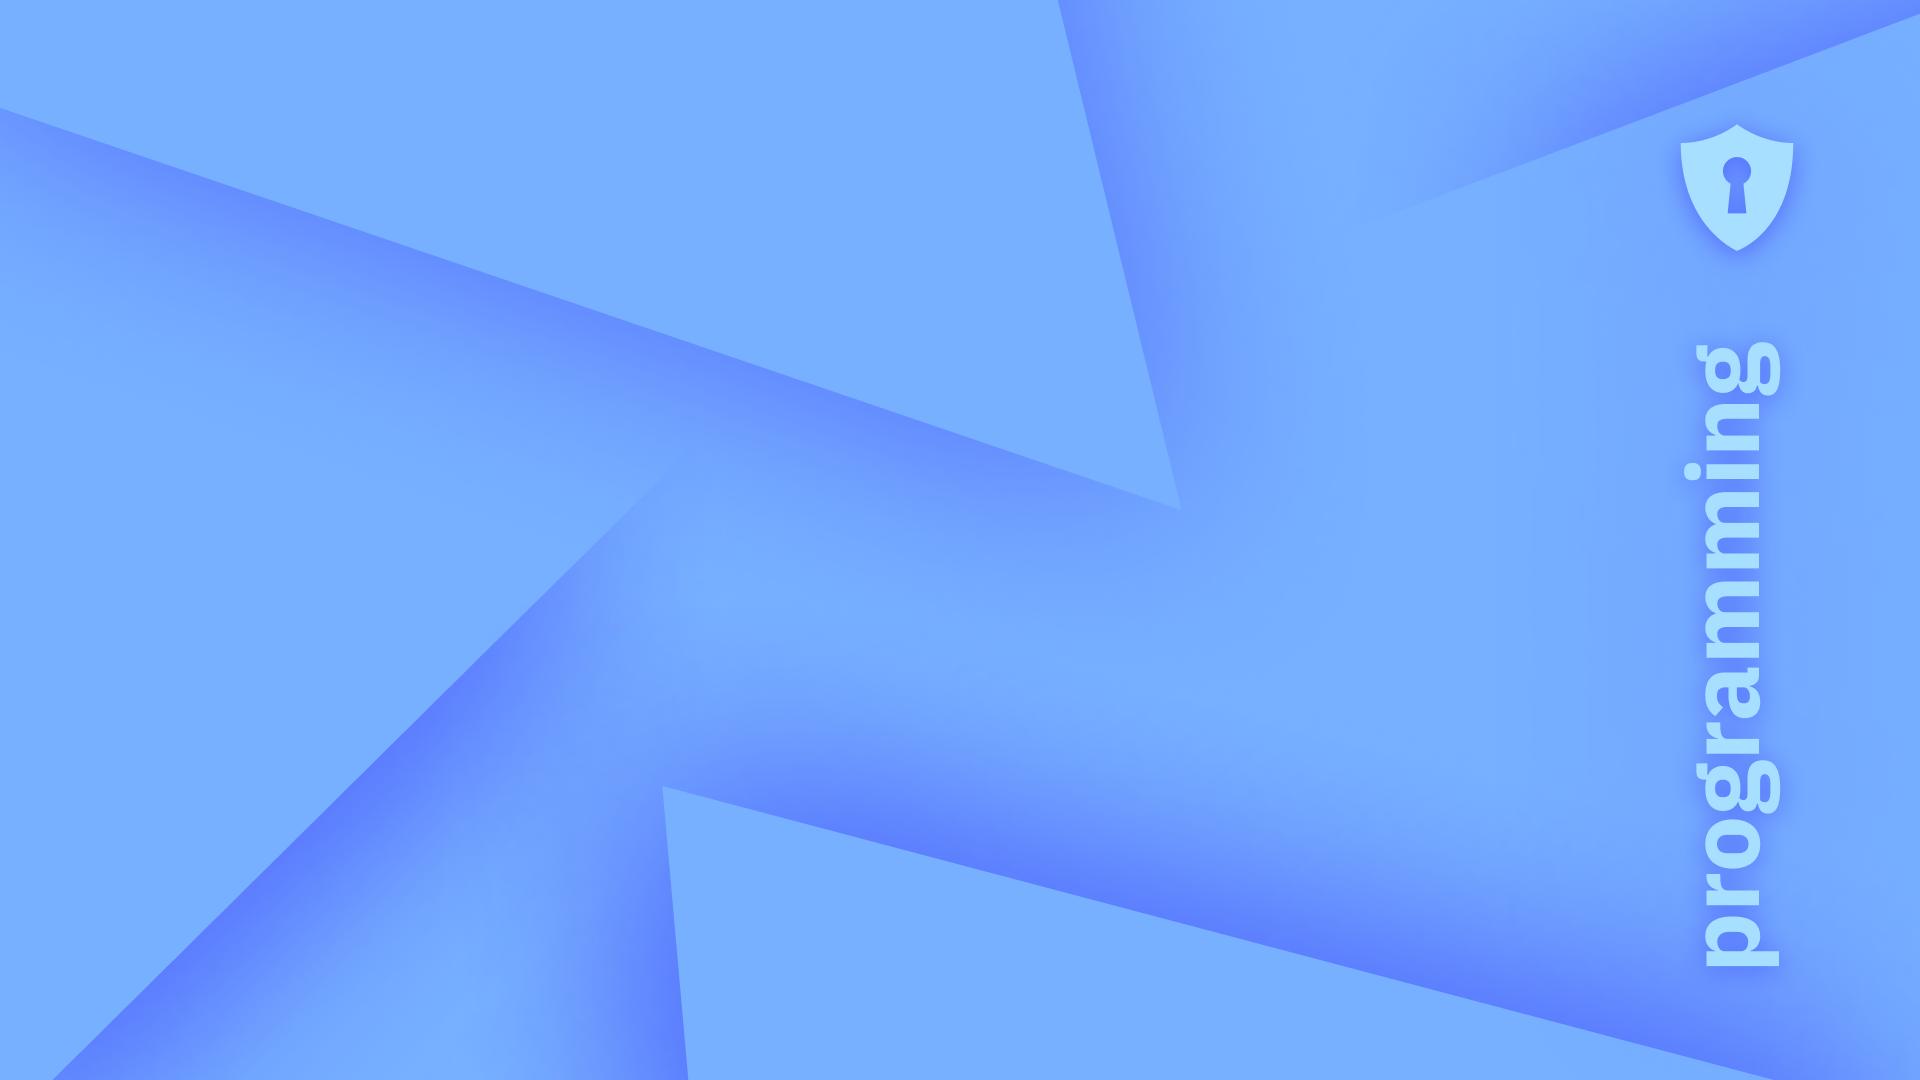 Вебинар Основы уязвимости Server-side template injection фото